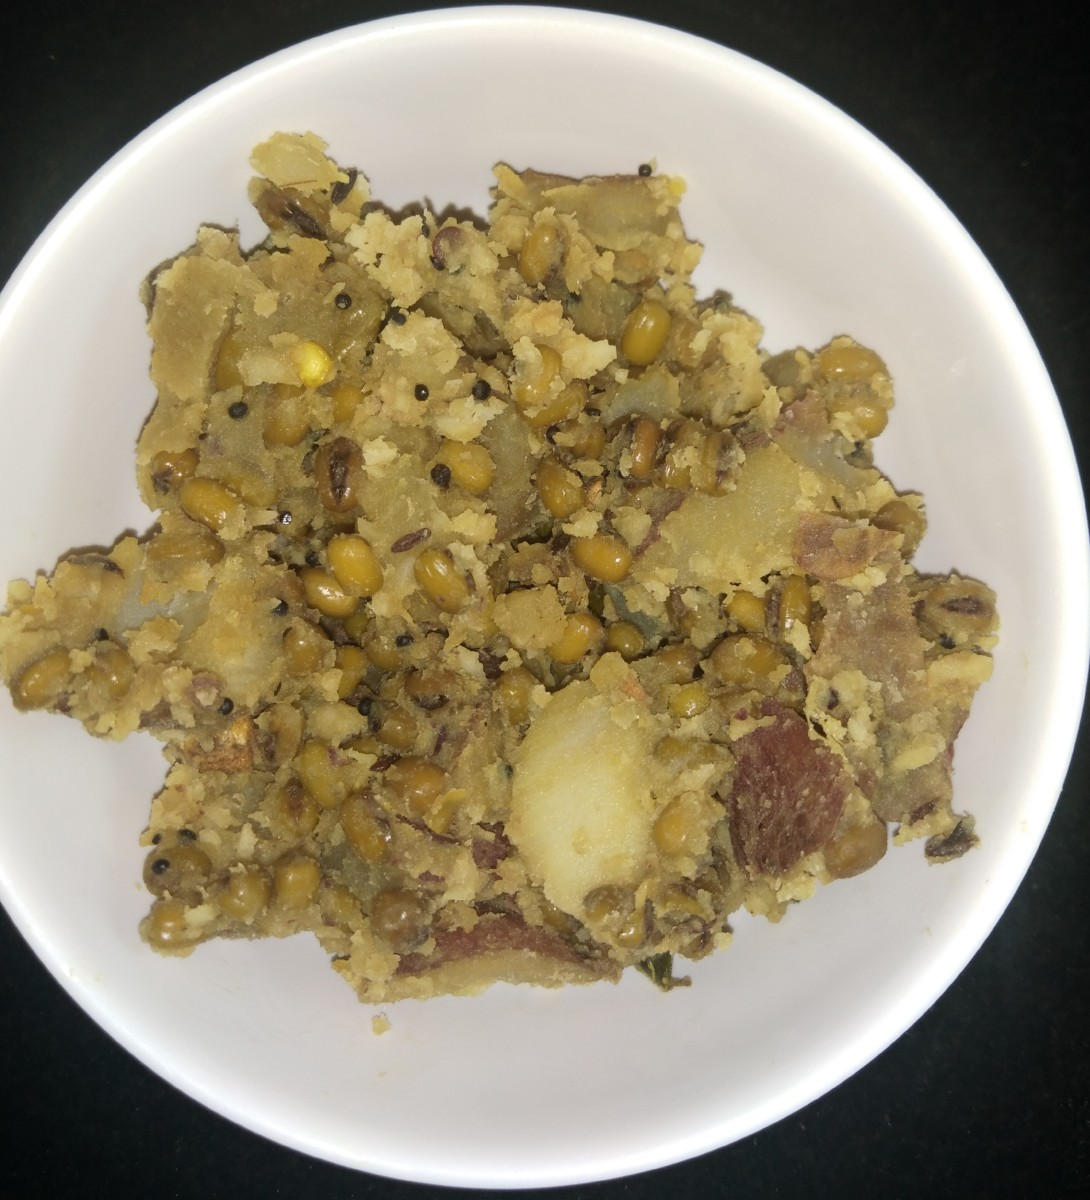 Sweet potato green gram stir-fry.